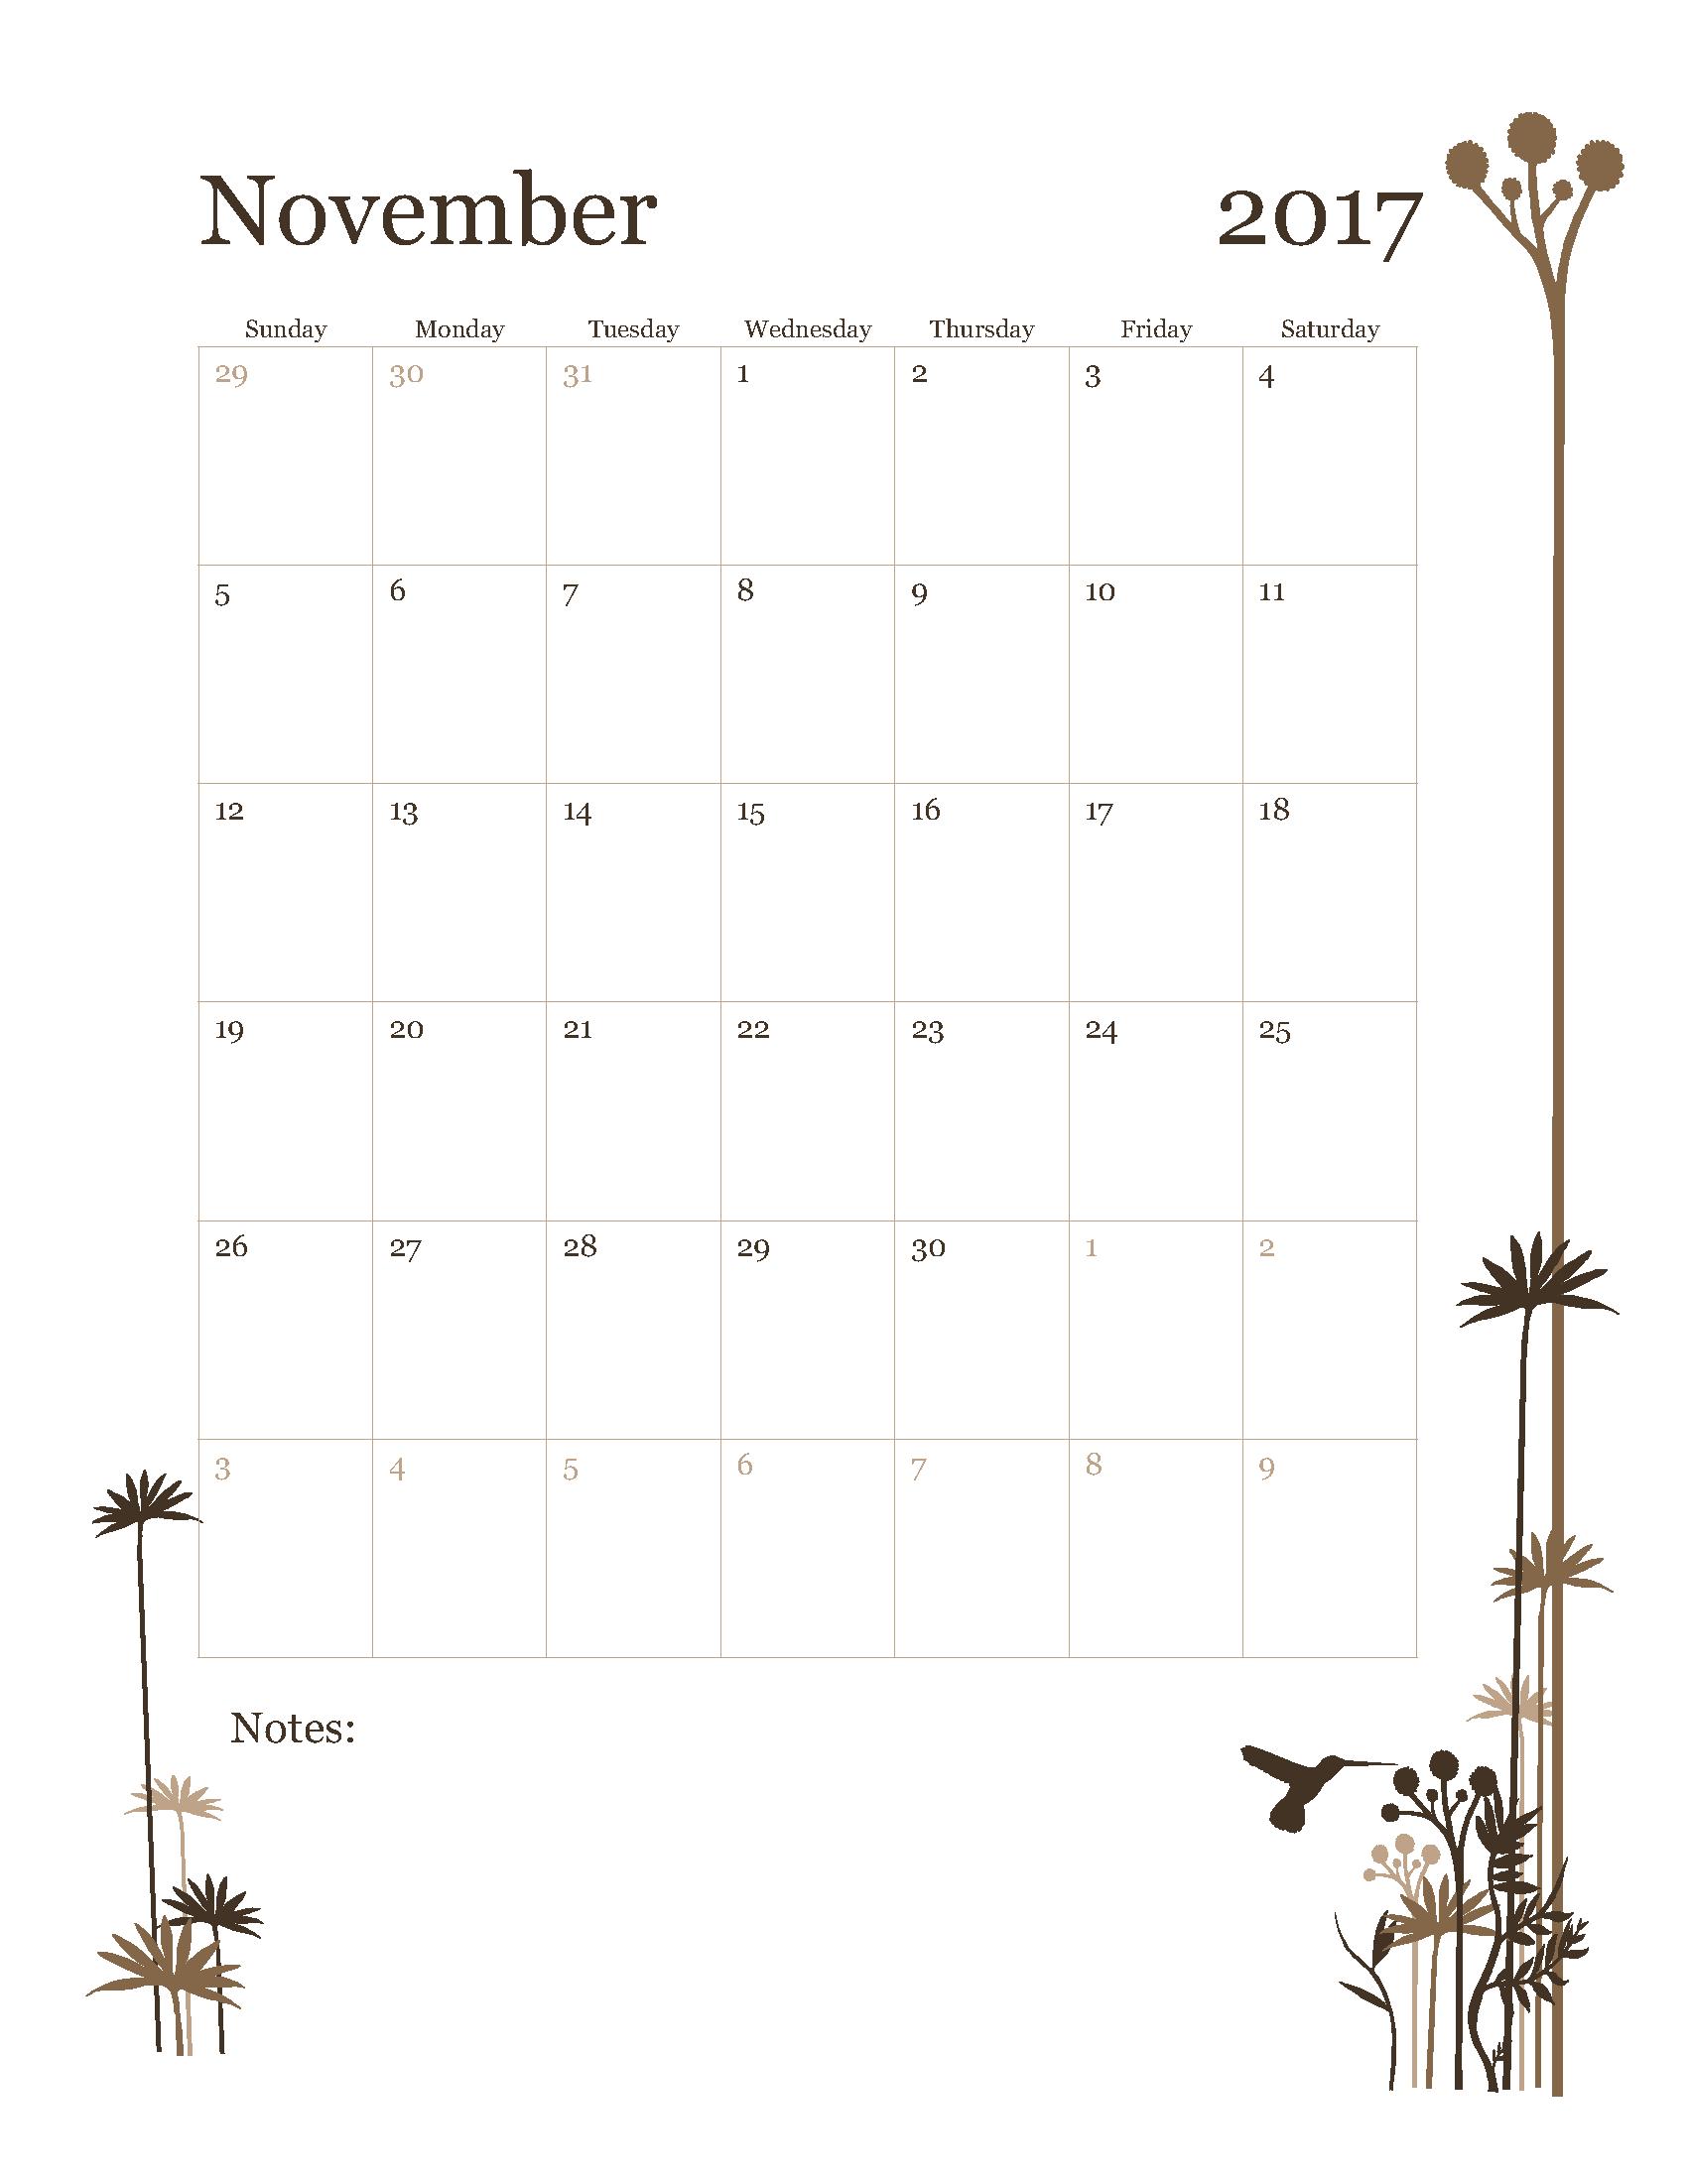 Free November 2017 Calendar Template Printable Start on Sunday - HummingBird design